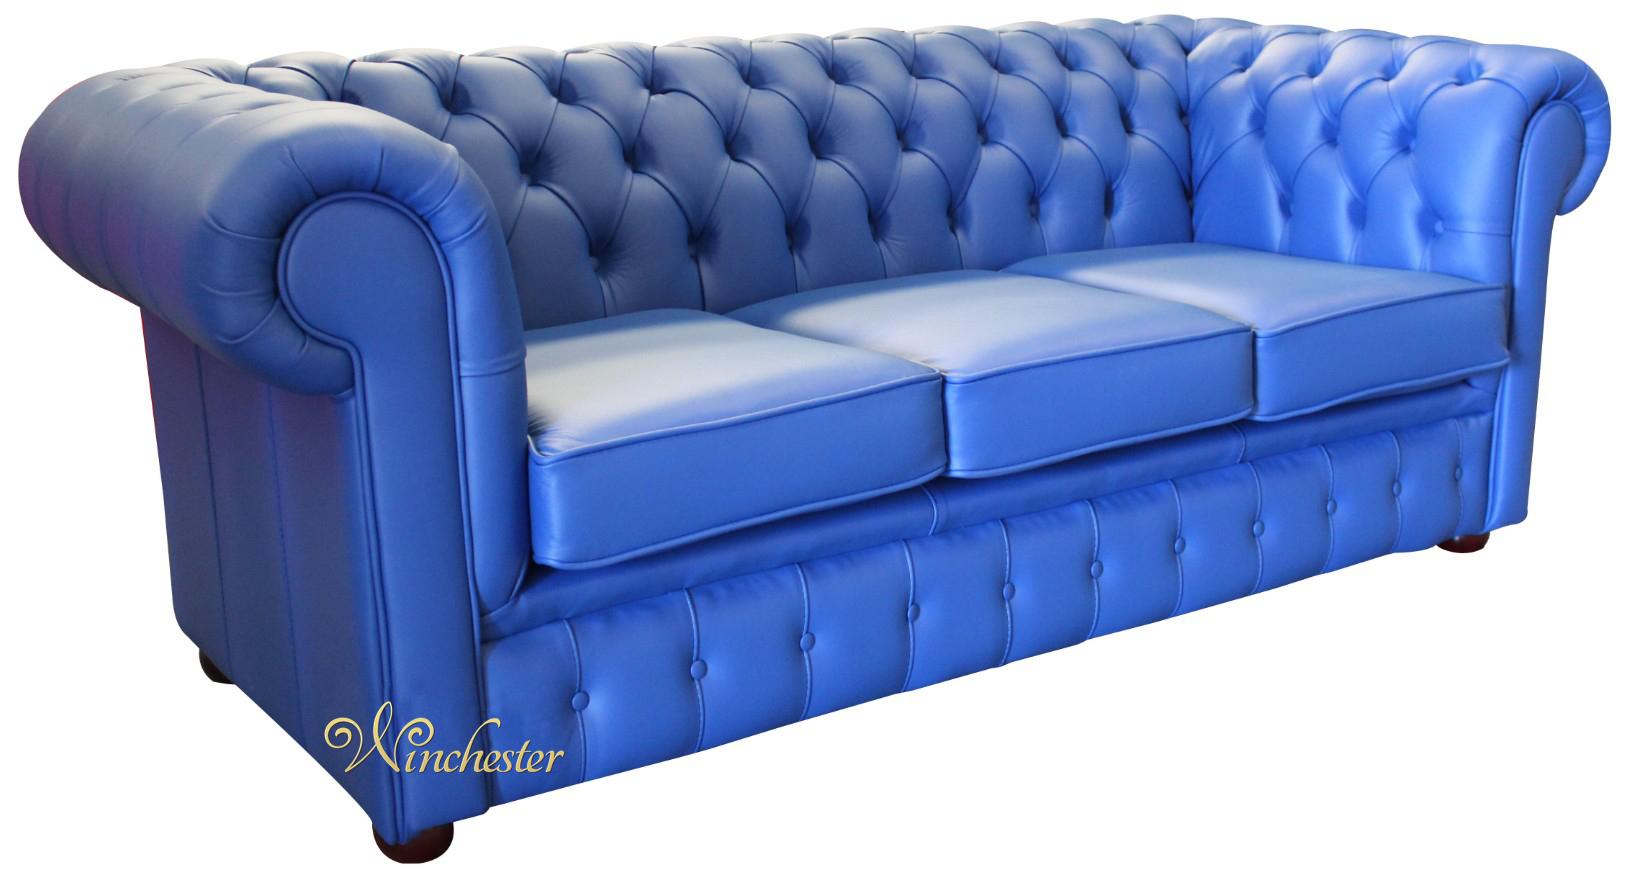 chesterfield thomas 3 seater settee deep ultramarine blue